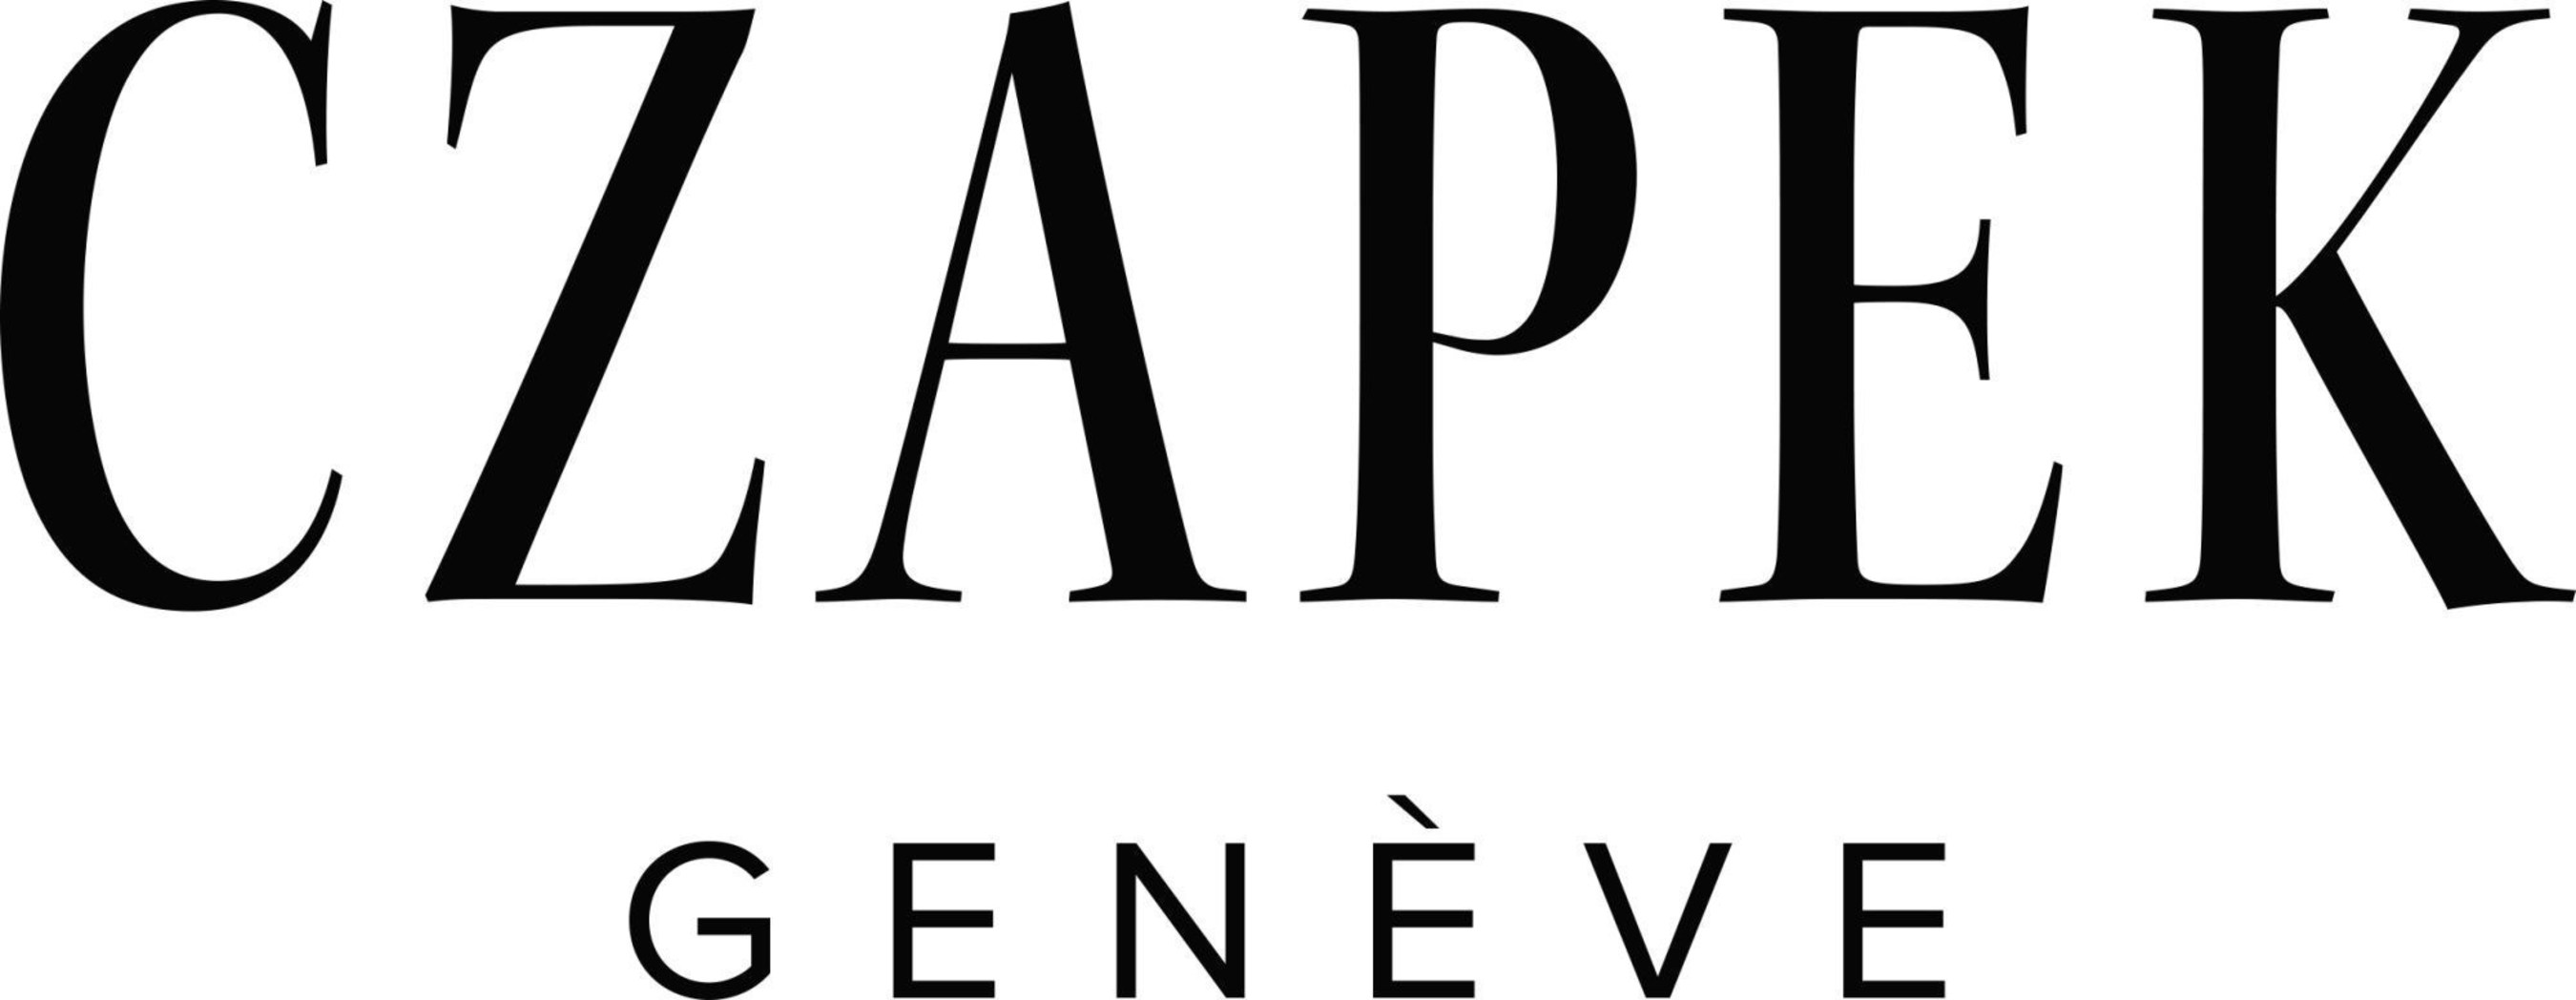 Czapek Logo (PRNewsFoto/Czapek and Cie)